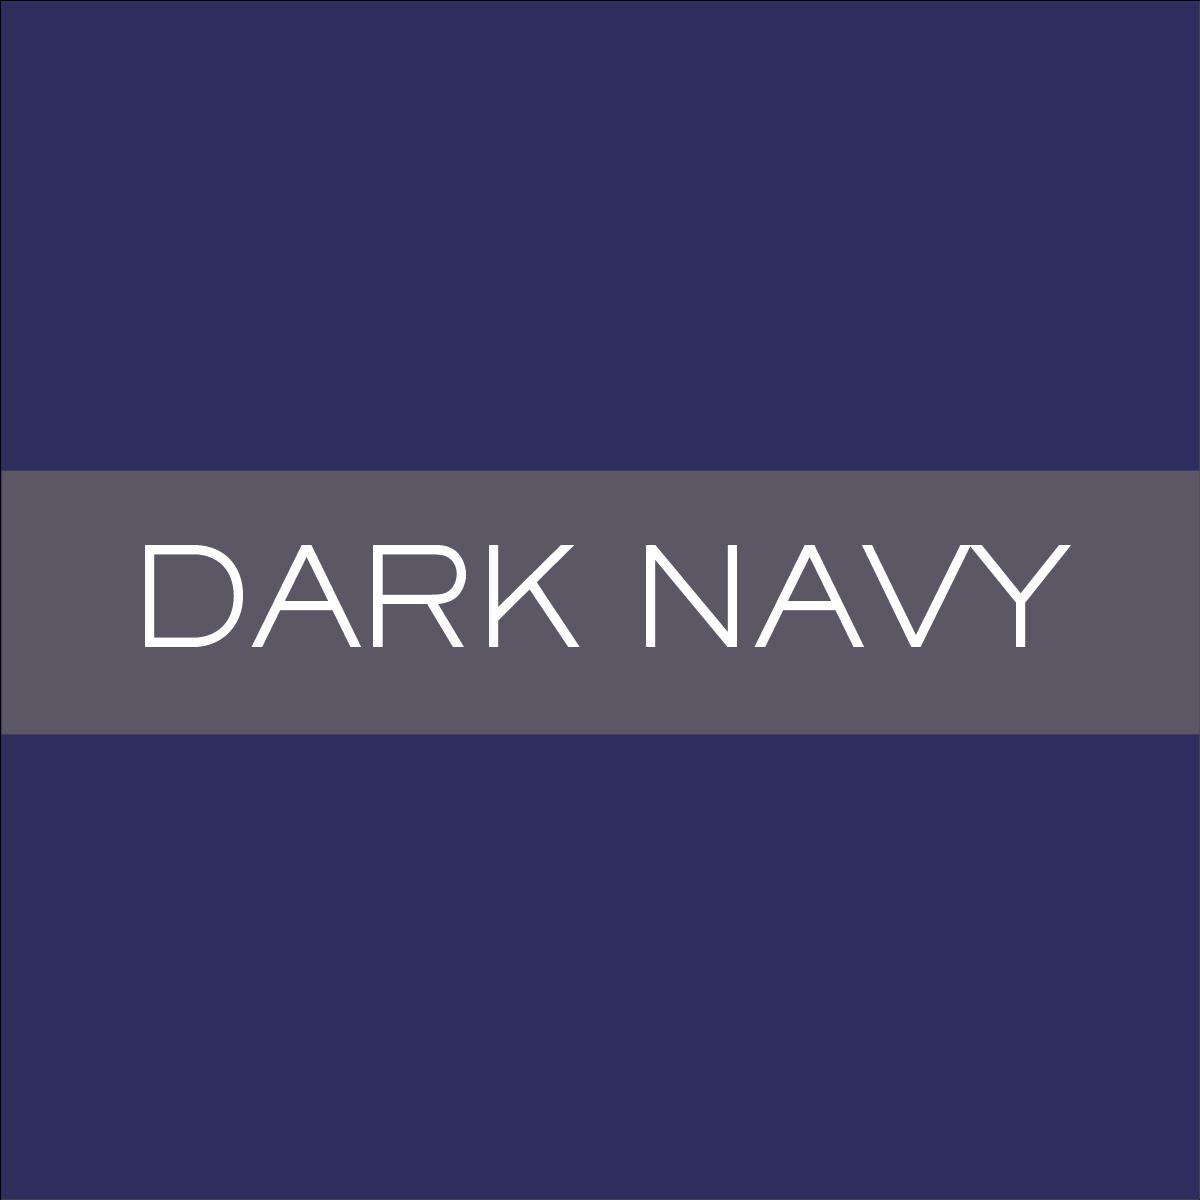 INK_DarkNavy.jpg